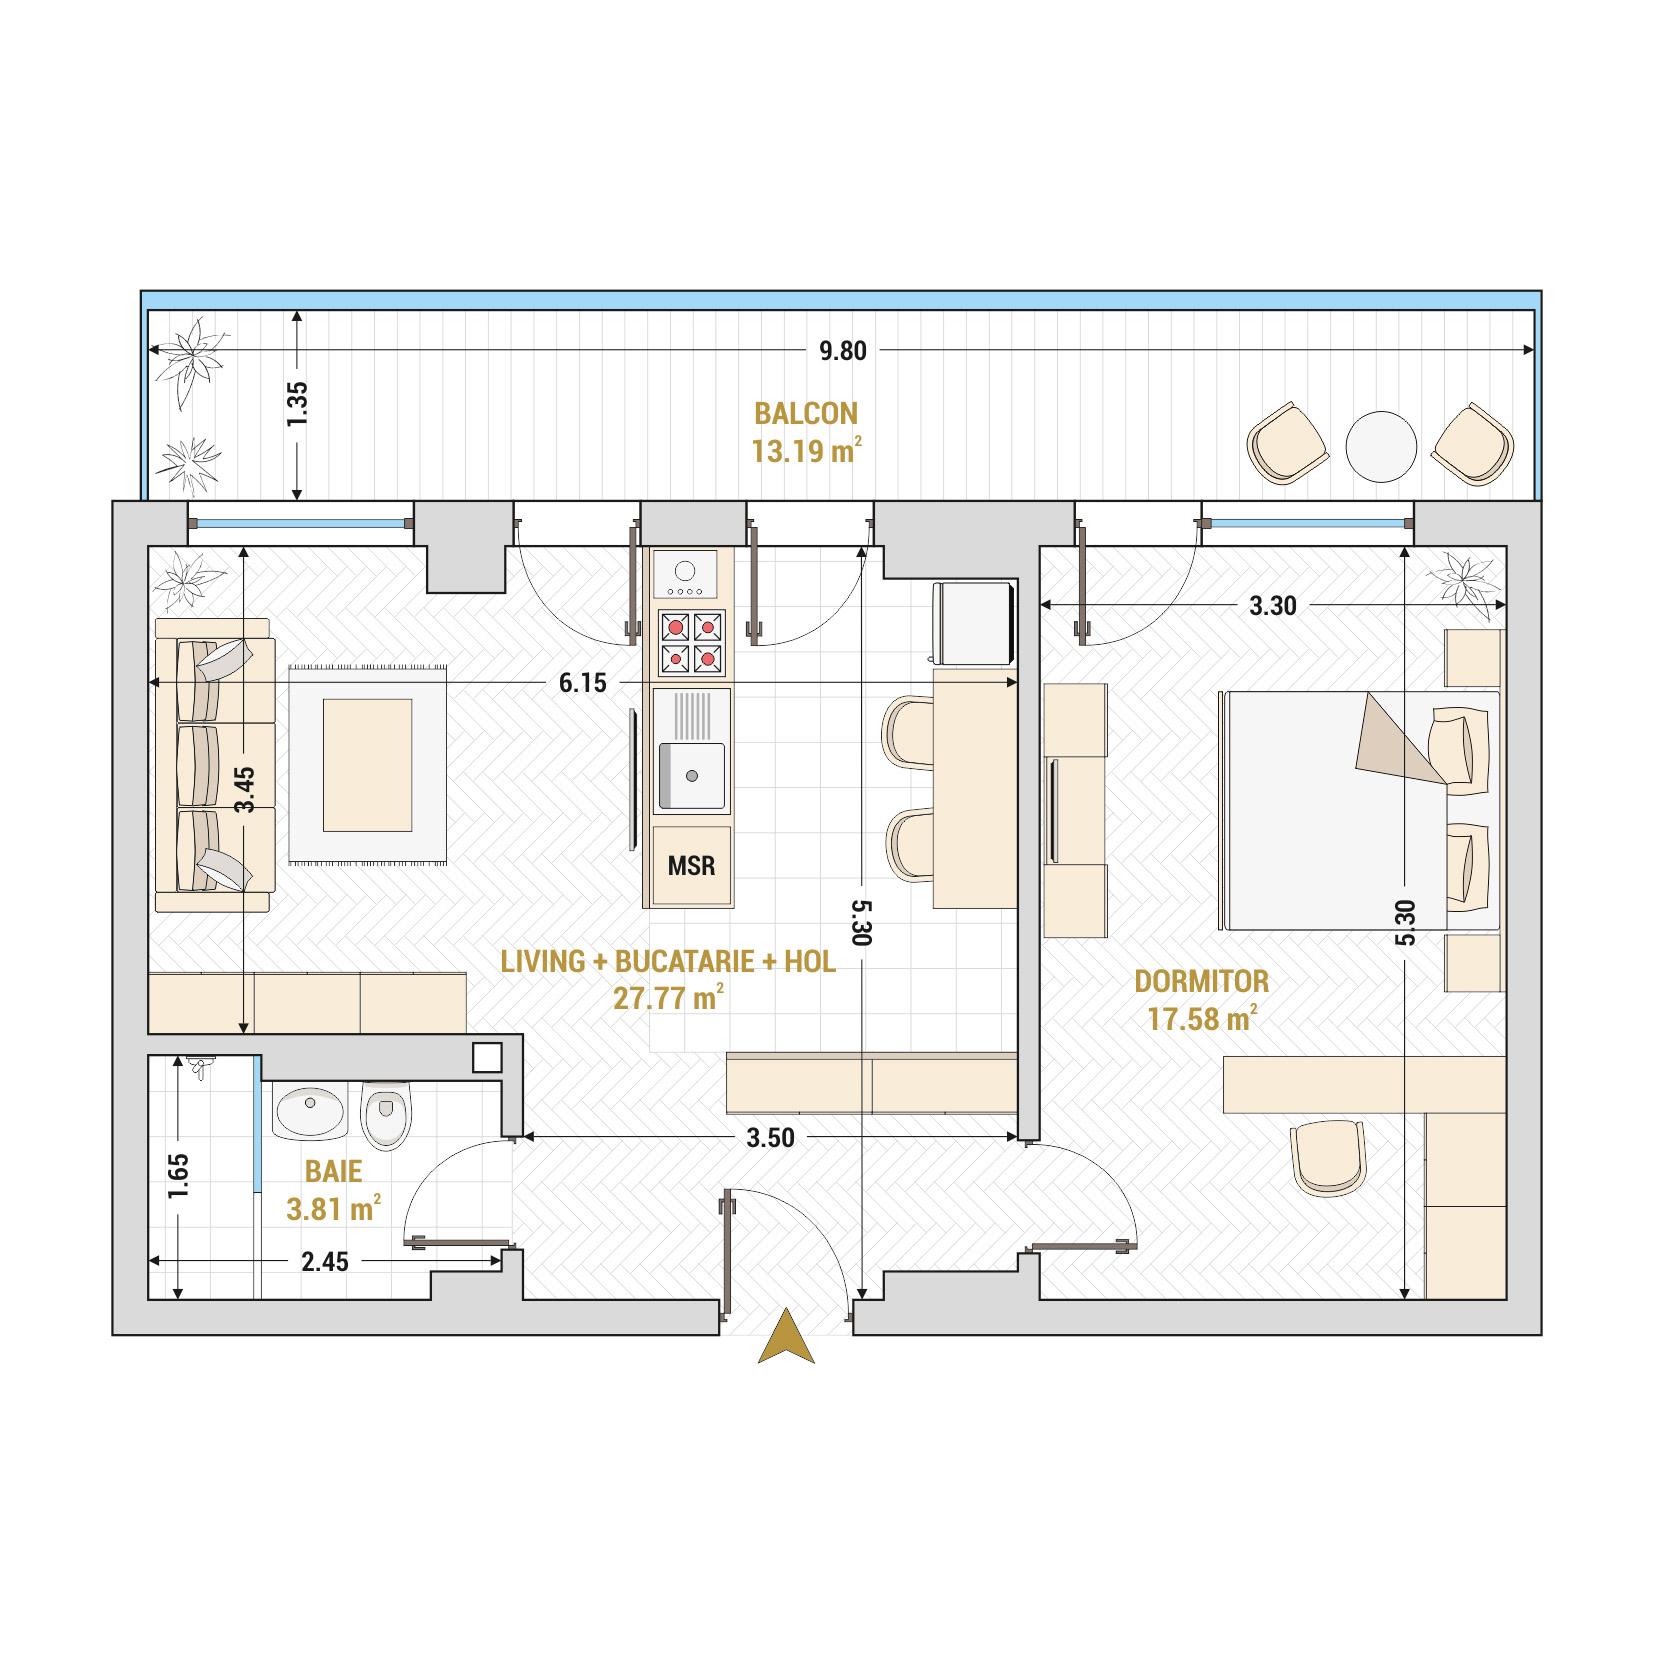 Apartamente cu 2 camere de vanzare Bucuresti - Catedral Residence - Marriott, Piata Unirii, 13 Septembrie, Izvor - Tip 5 - T1A